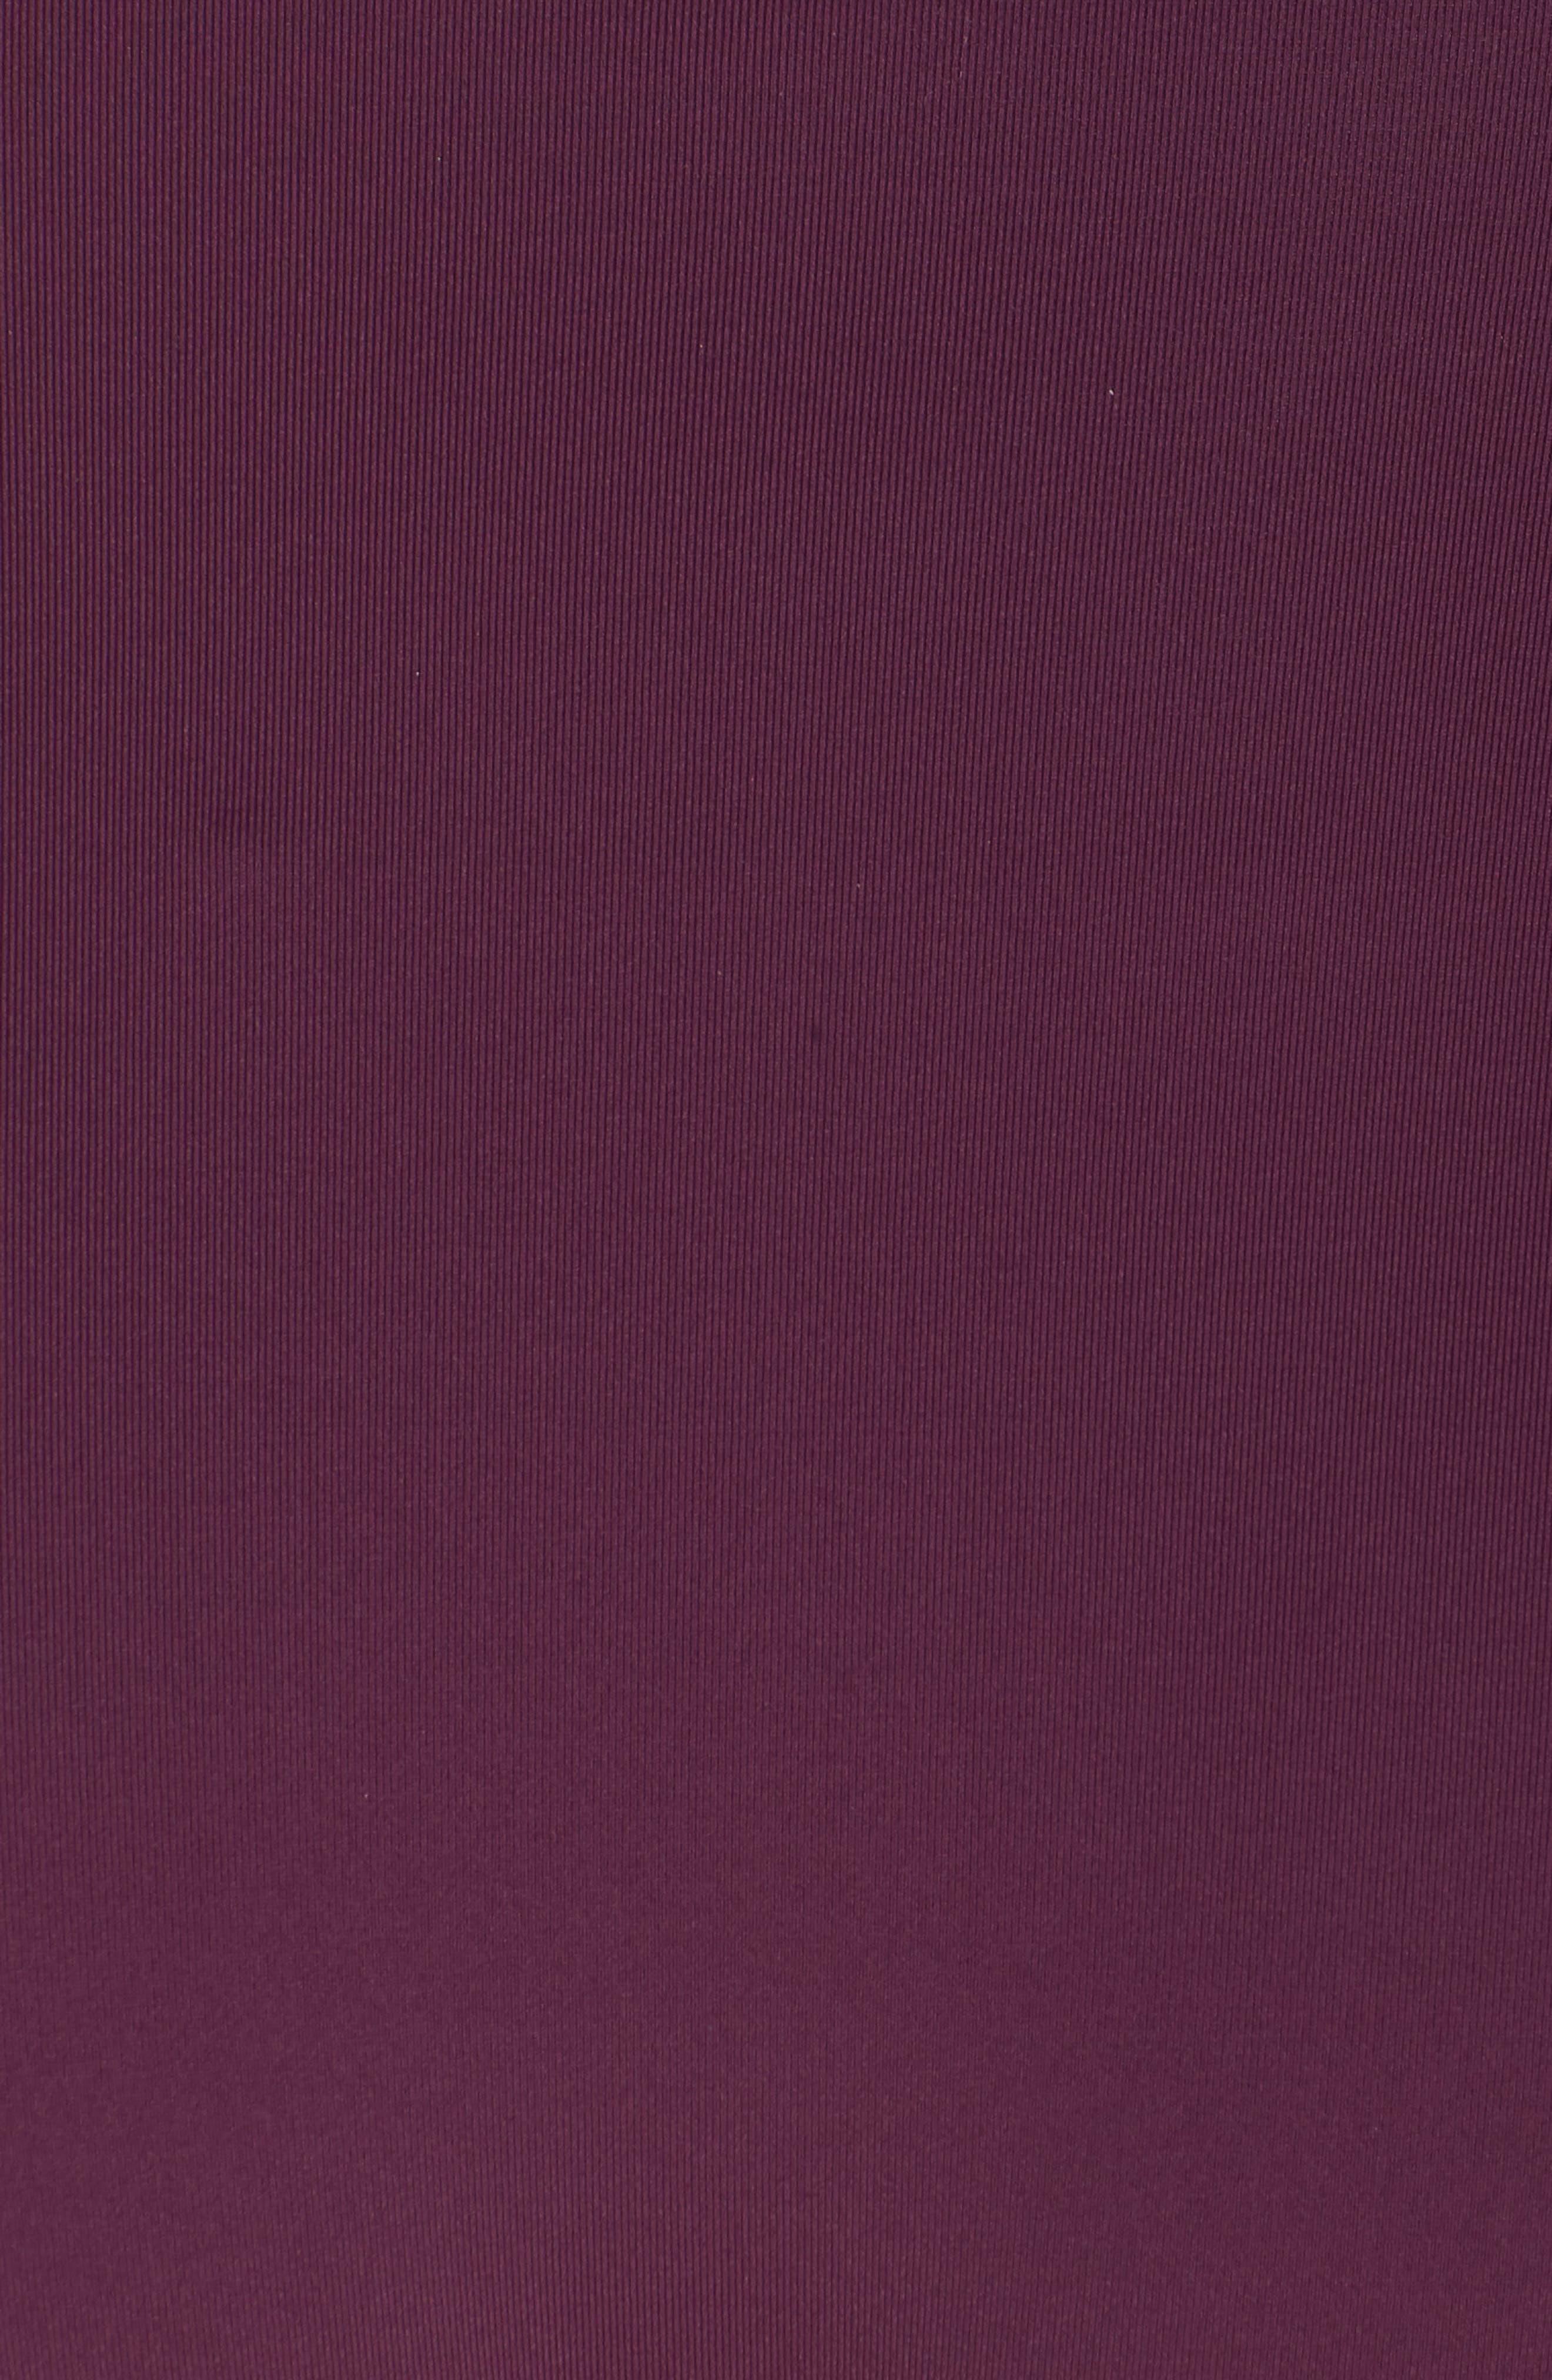 BECCA, Color Code Crossover High Waist Bikini Bottoms, Alternate thumbnail 6, color, MERLOT